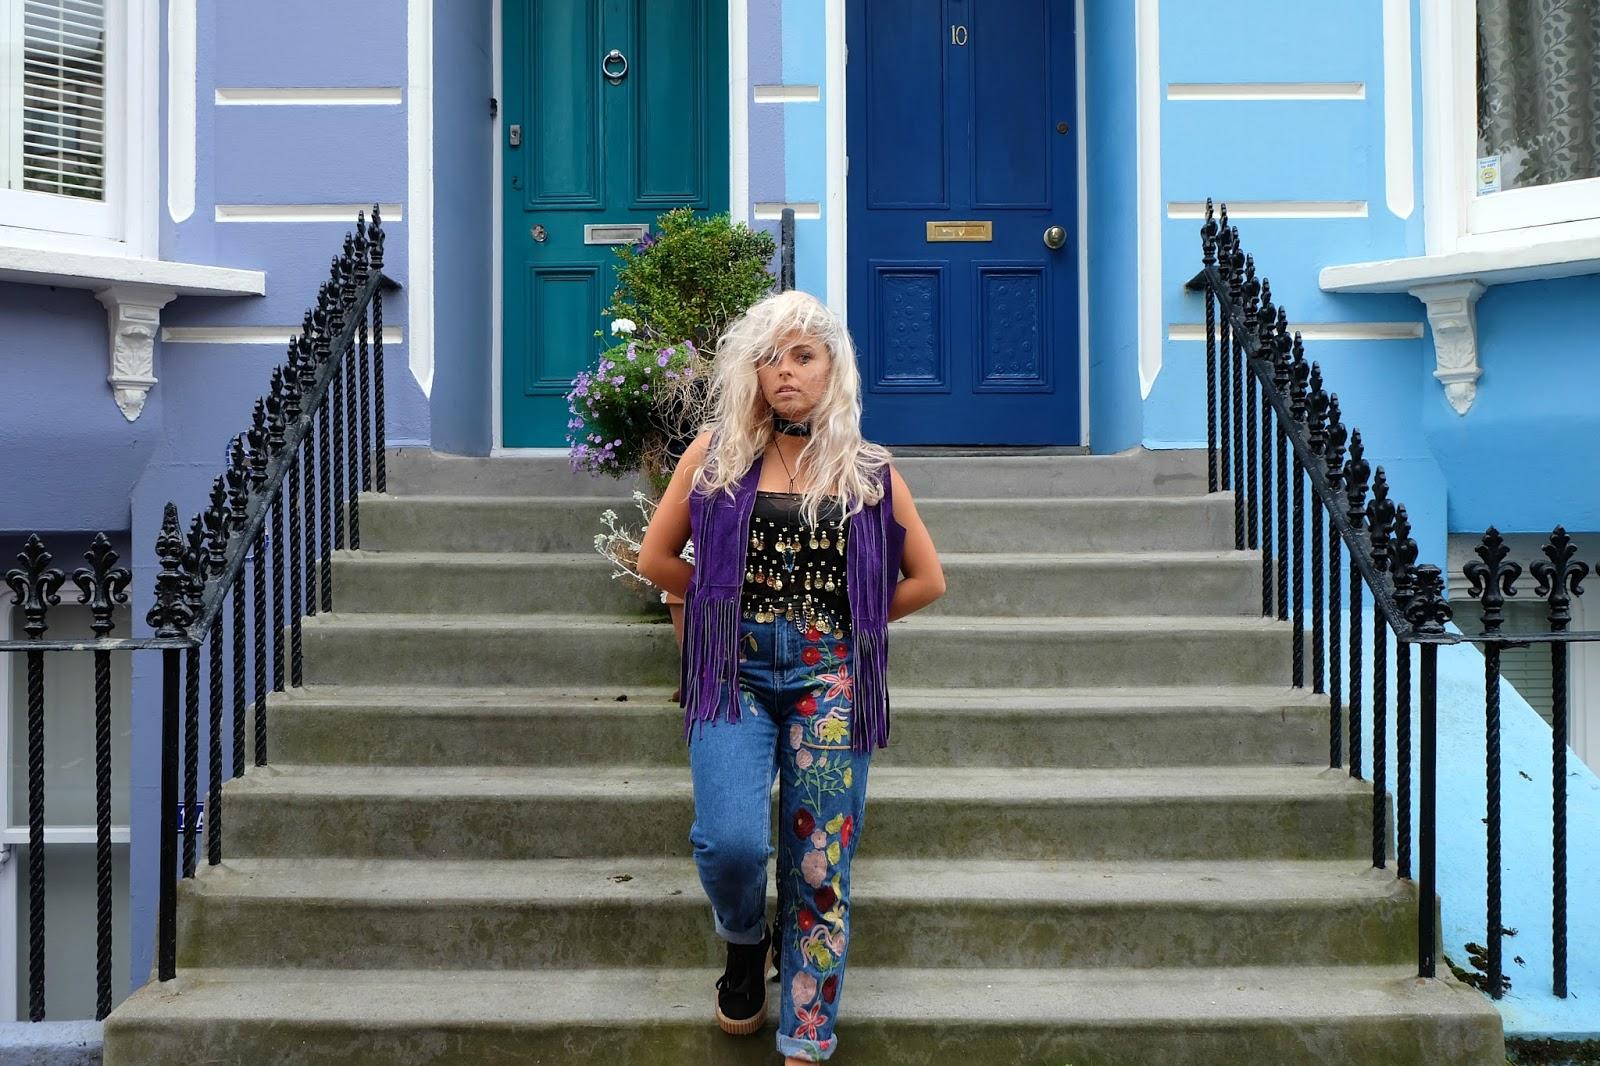 Brighton colourful houses 2016